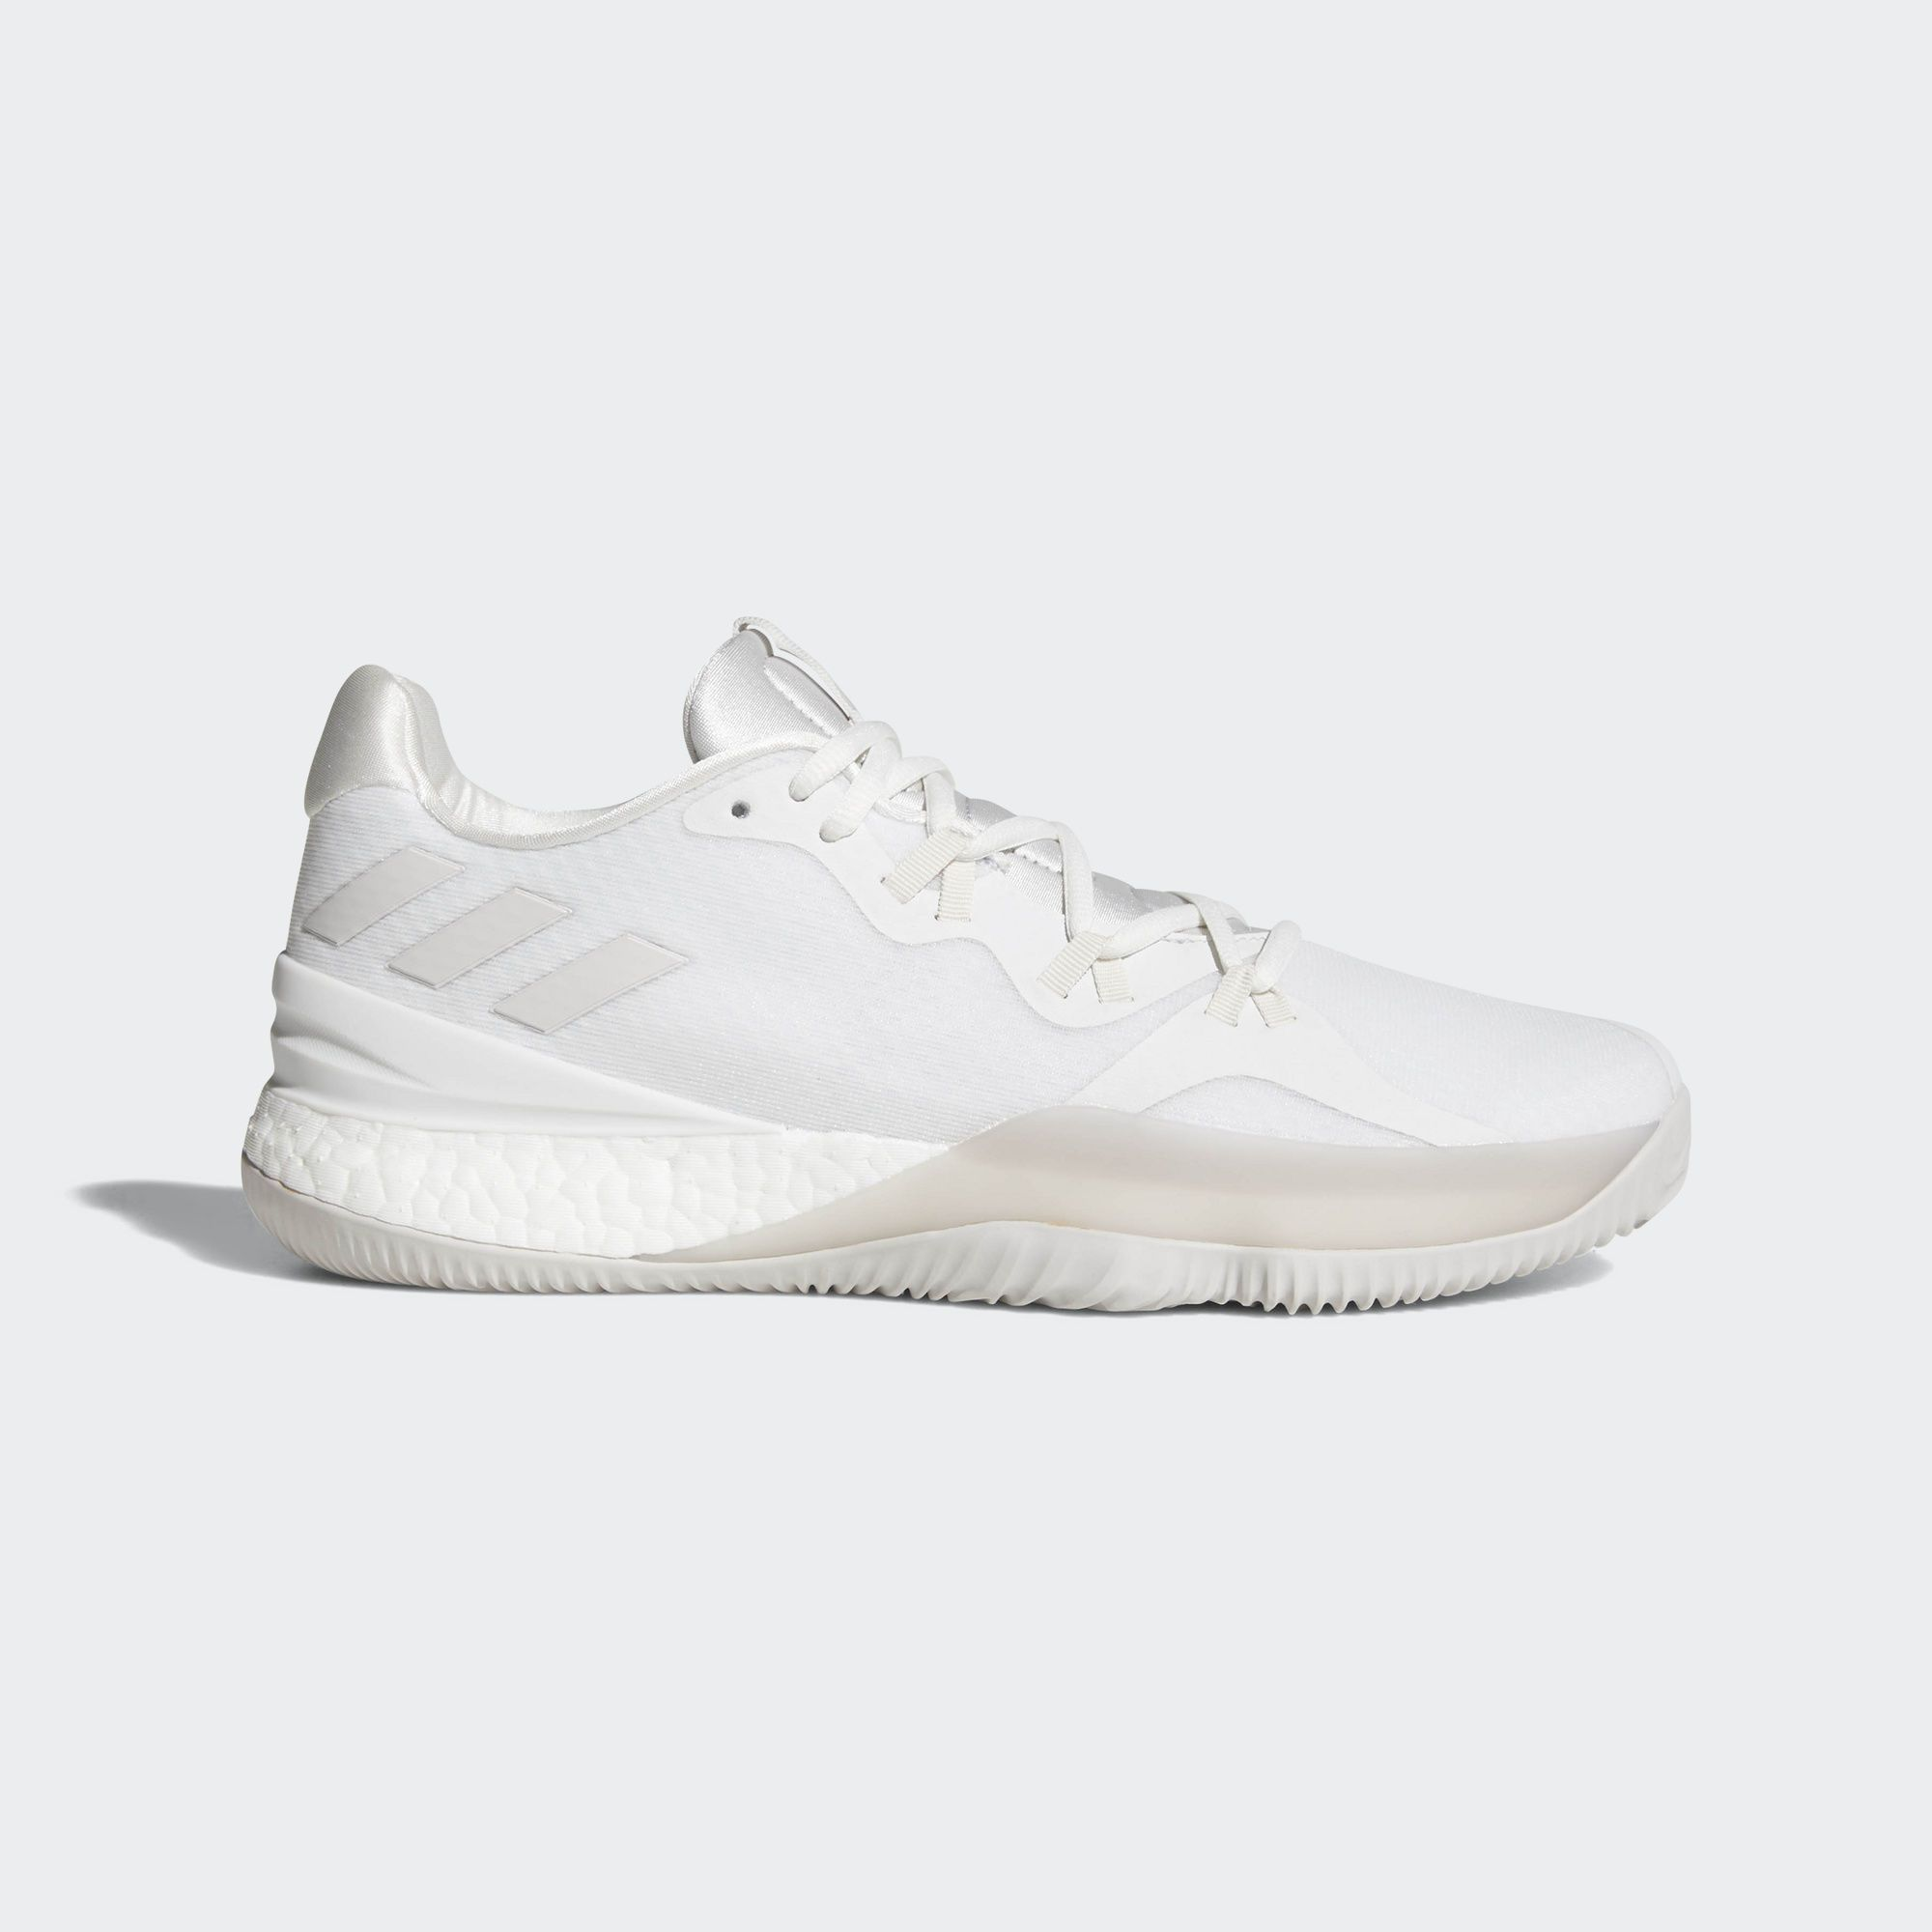 Boost Chaussure 2018 adidas blanc Crazylight maintenant rChsdtQx